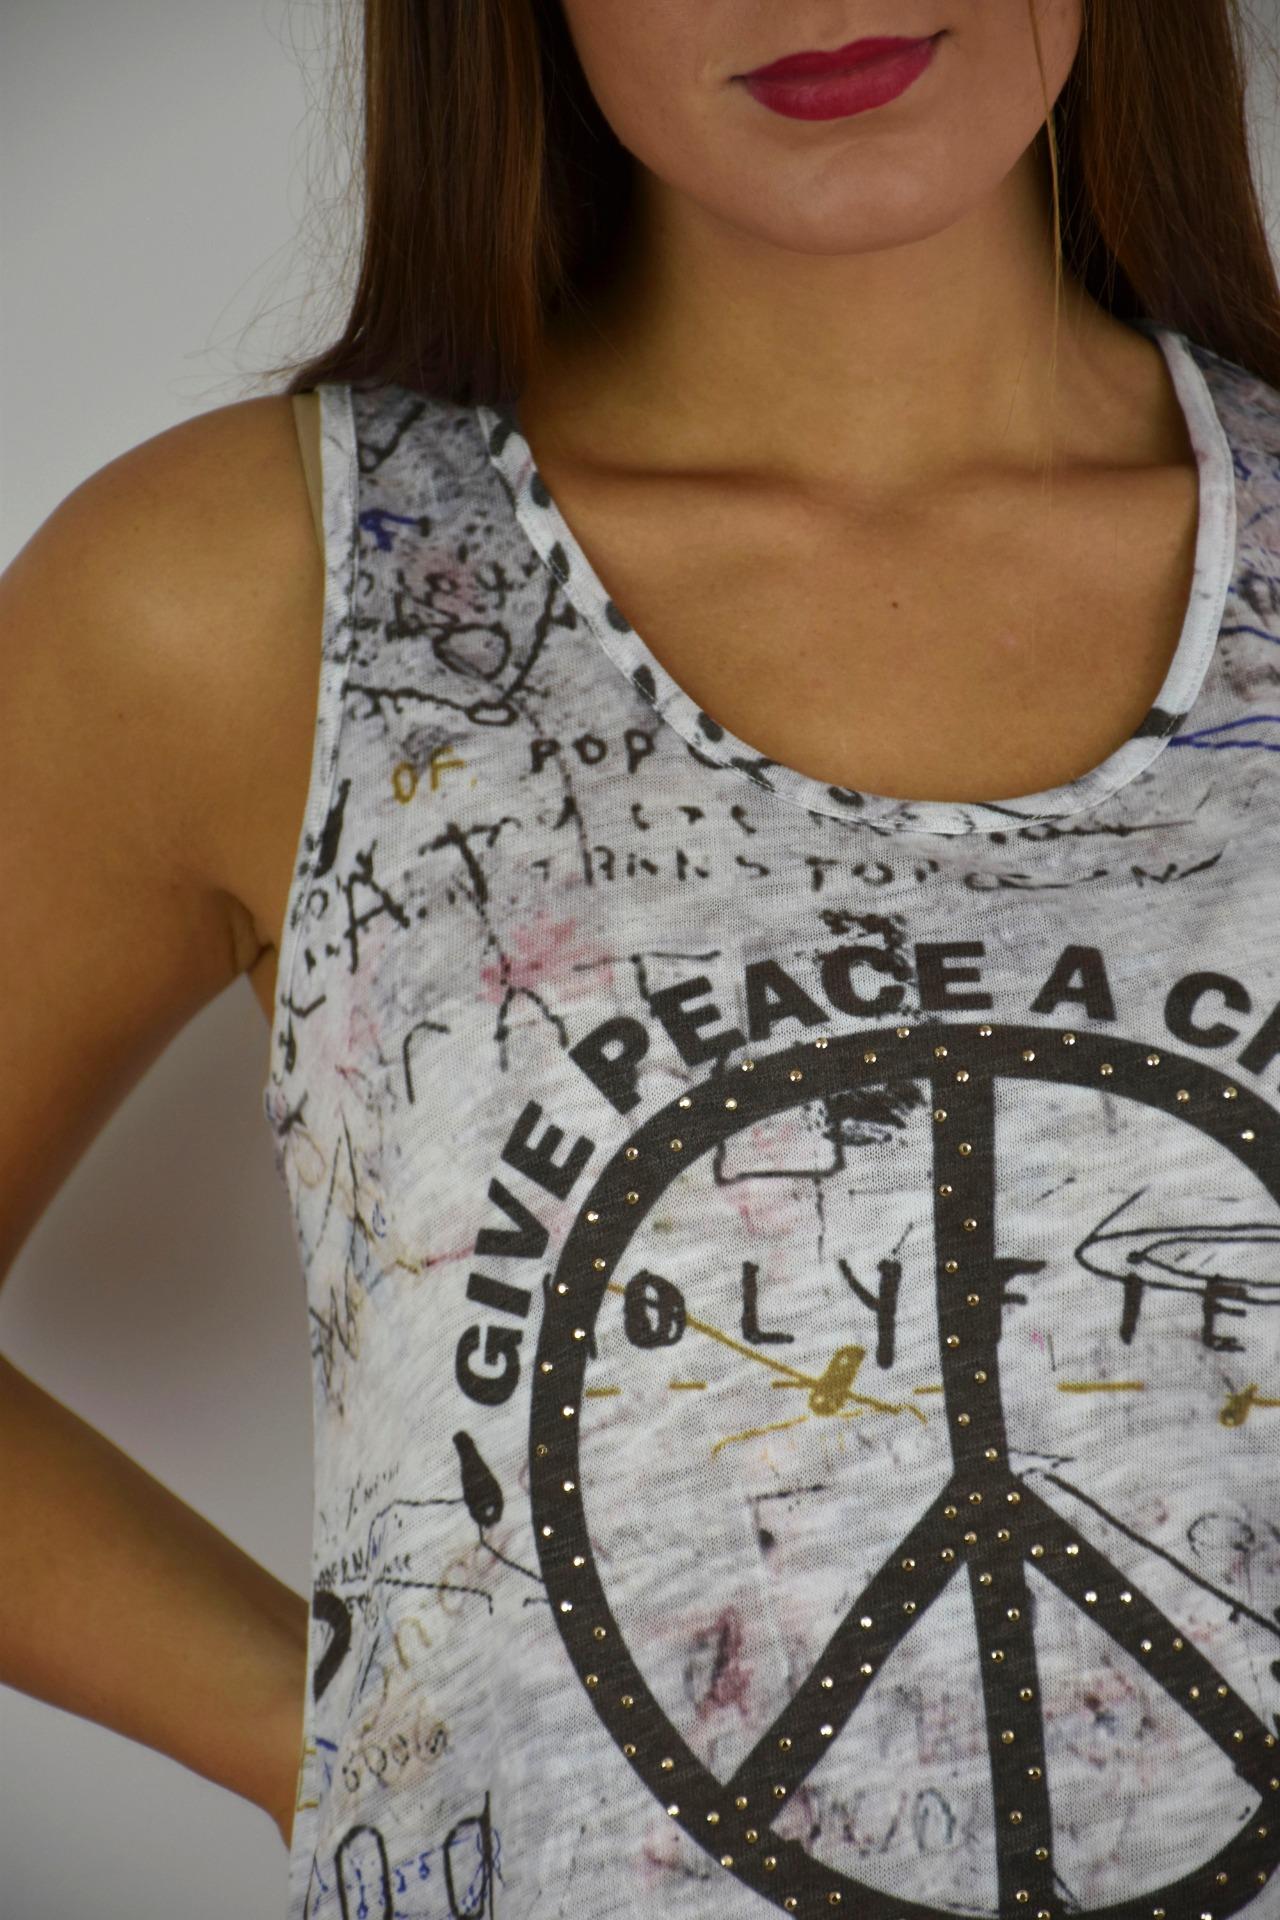 camiseta pura vida peace 3